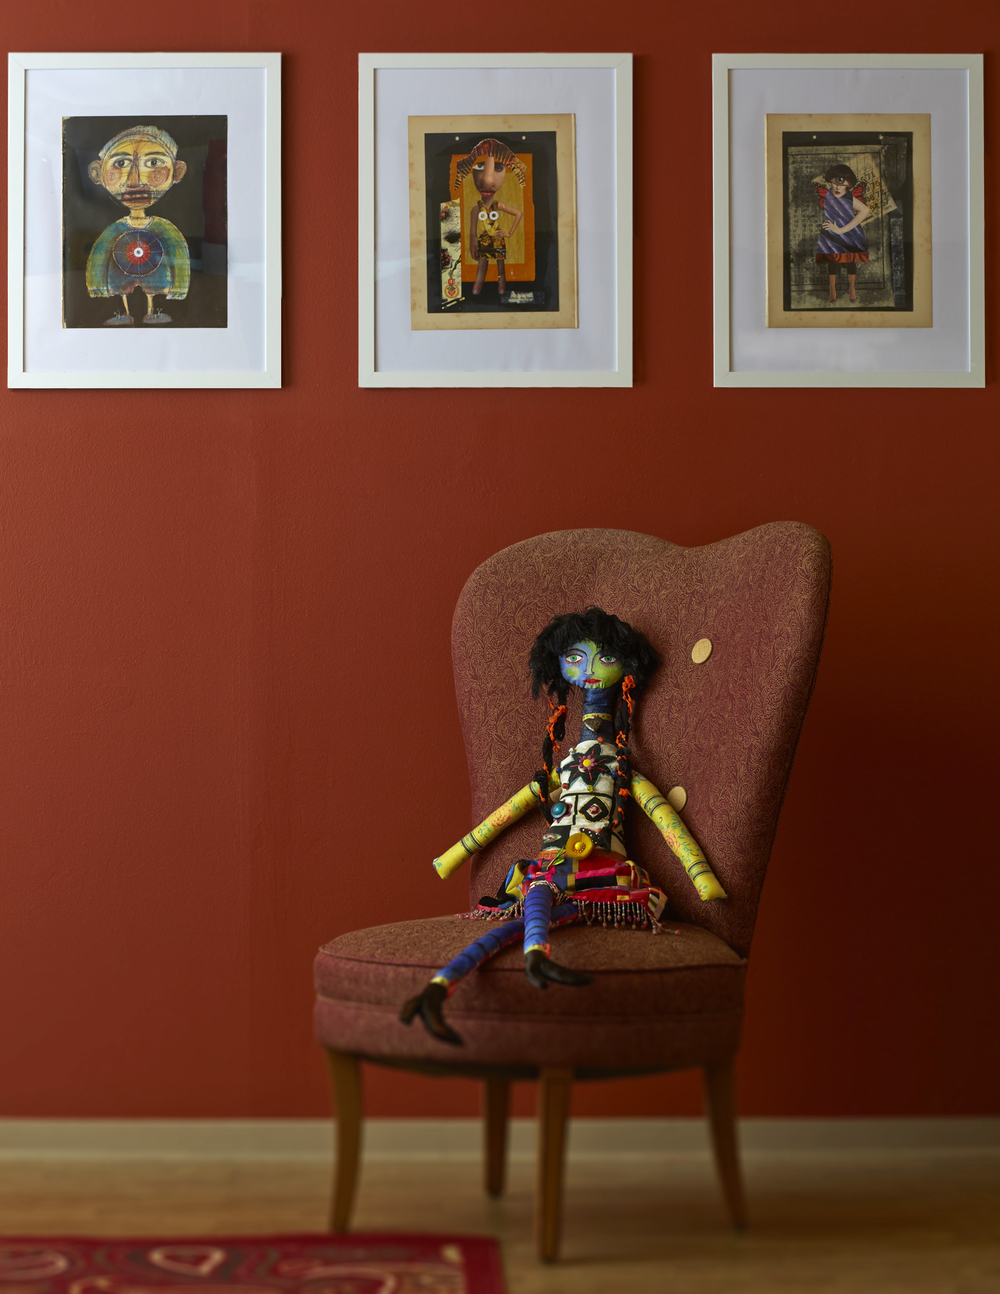 MY ART WITH MY FAVORITE ART DOLL BY LORI SIEBERT